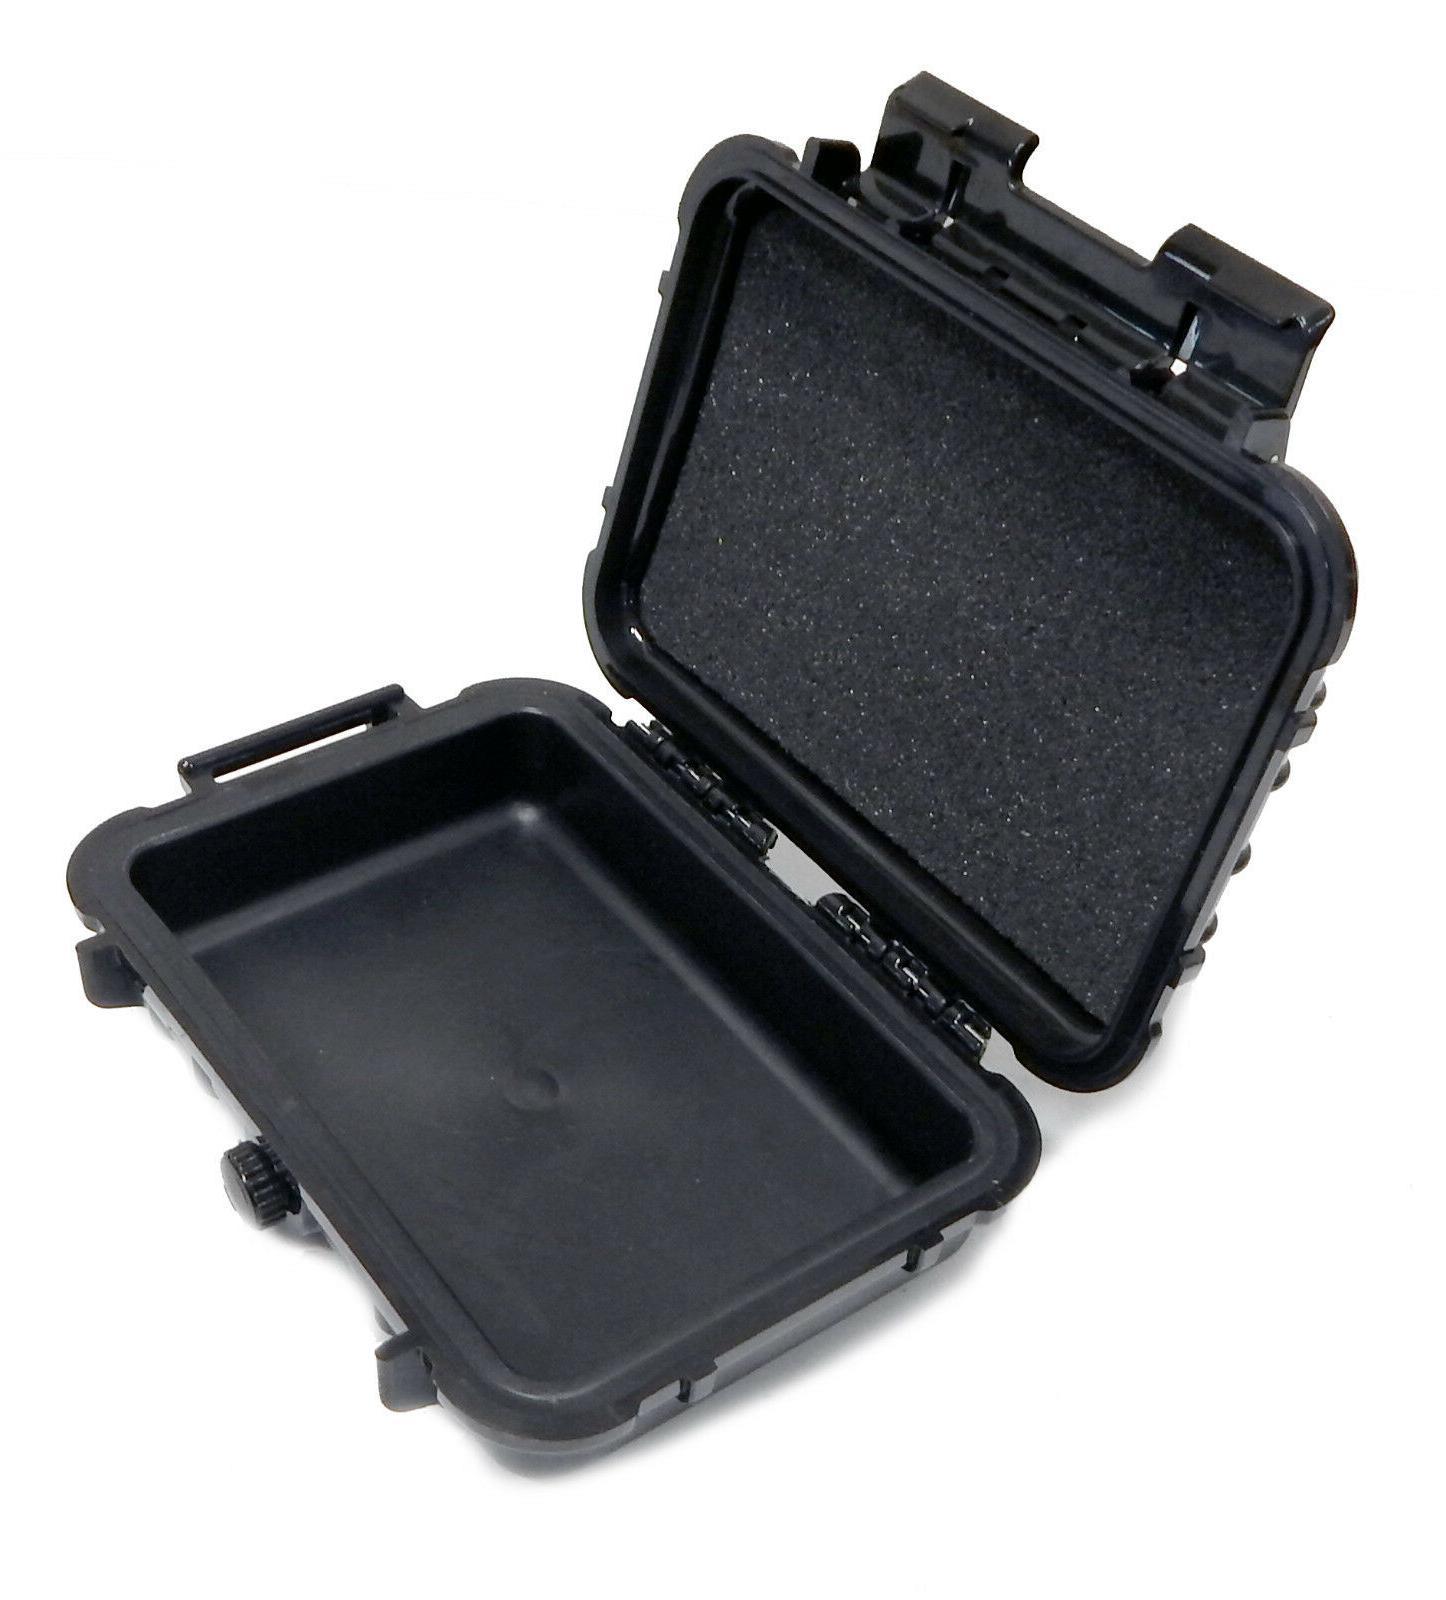 Waterproof Camera Case Fits Vuze XR Dual VR